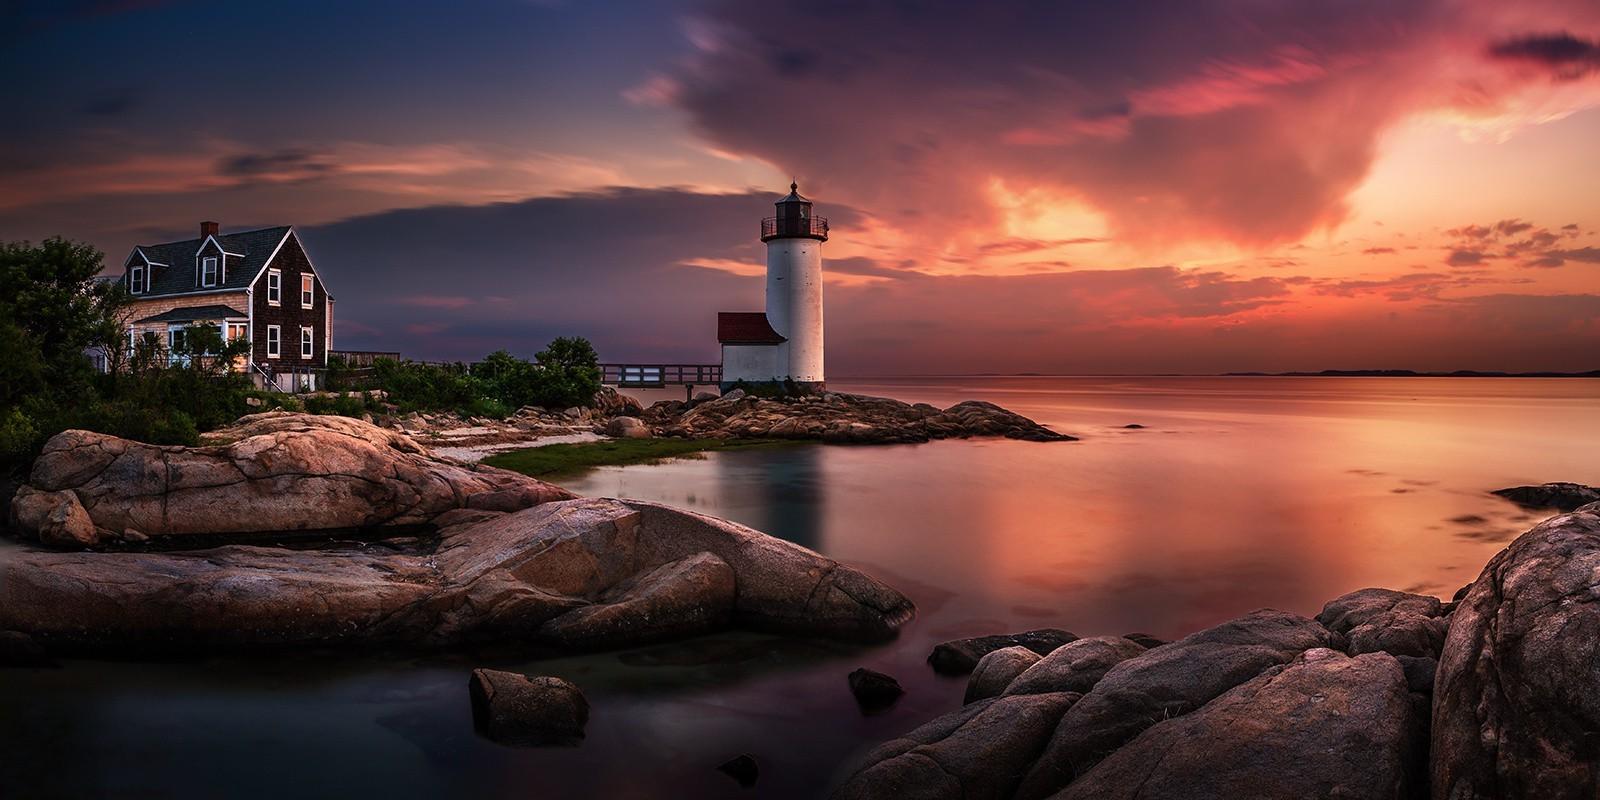 Fall Weather Wallpaper Nature Landscape Sunset Lighthouse Massachusetts Sky